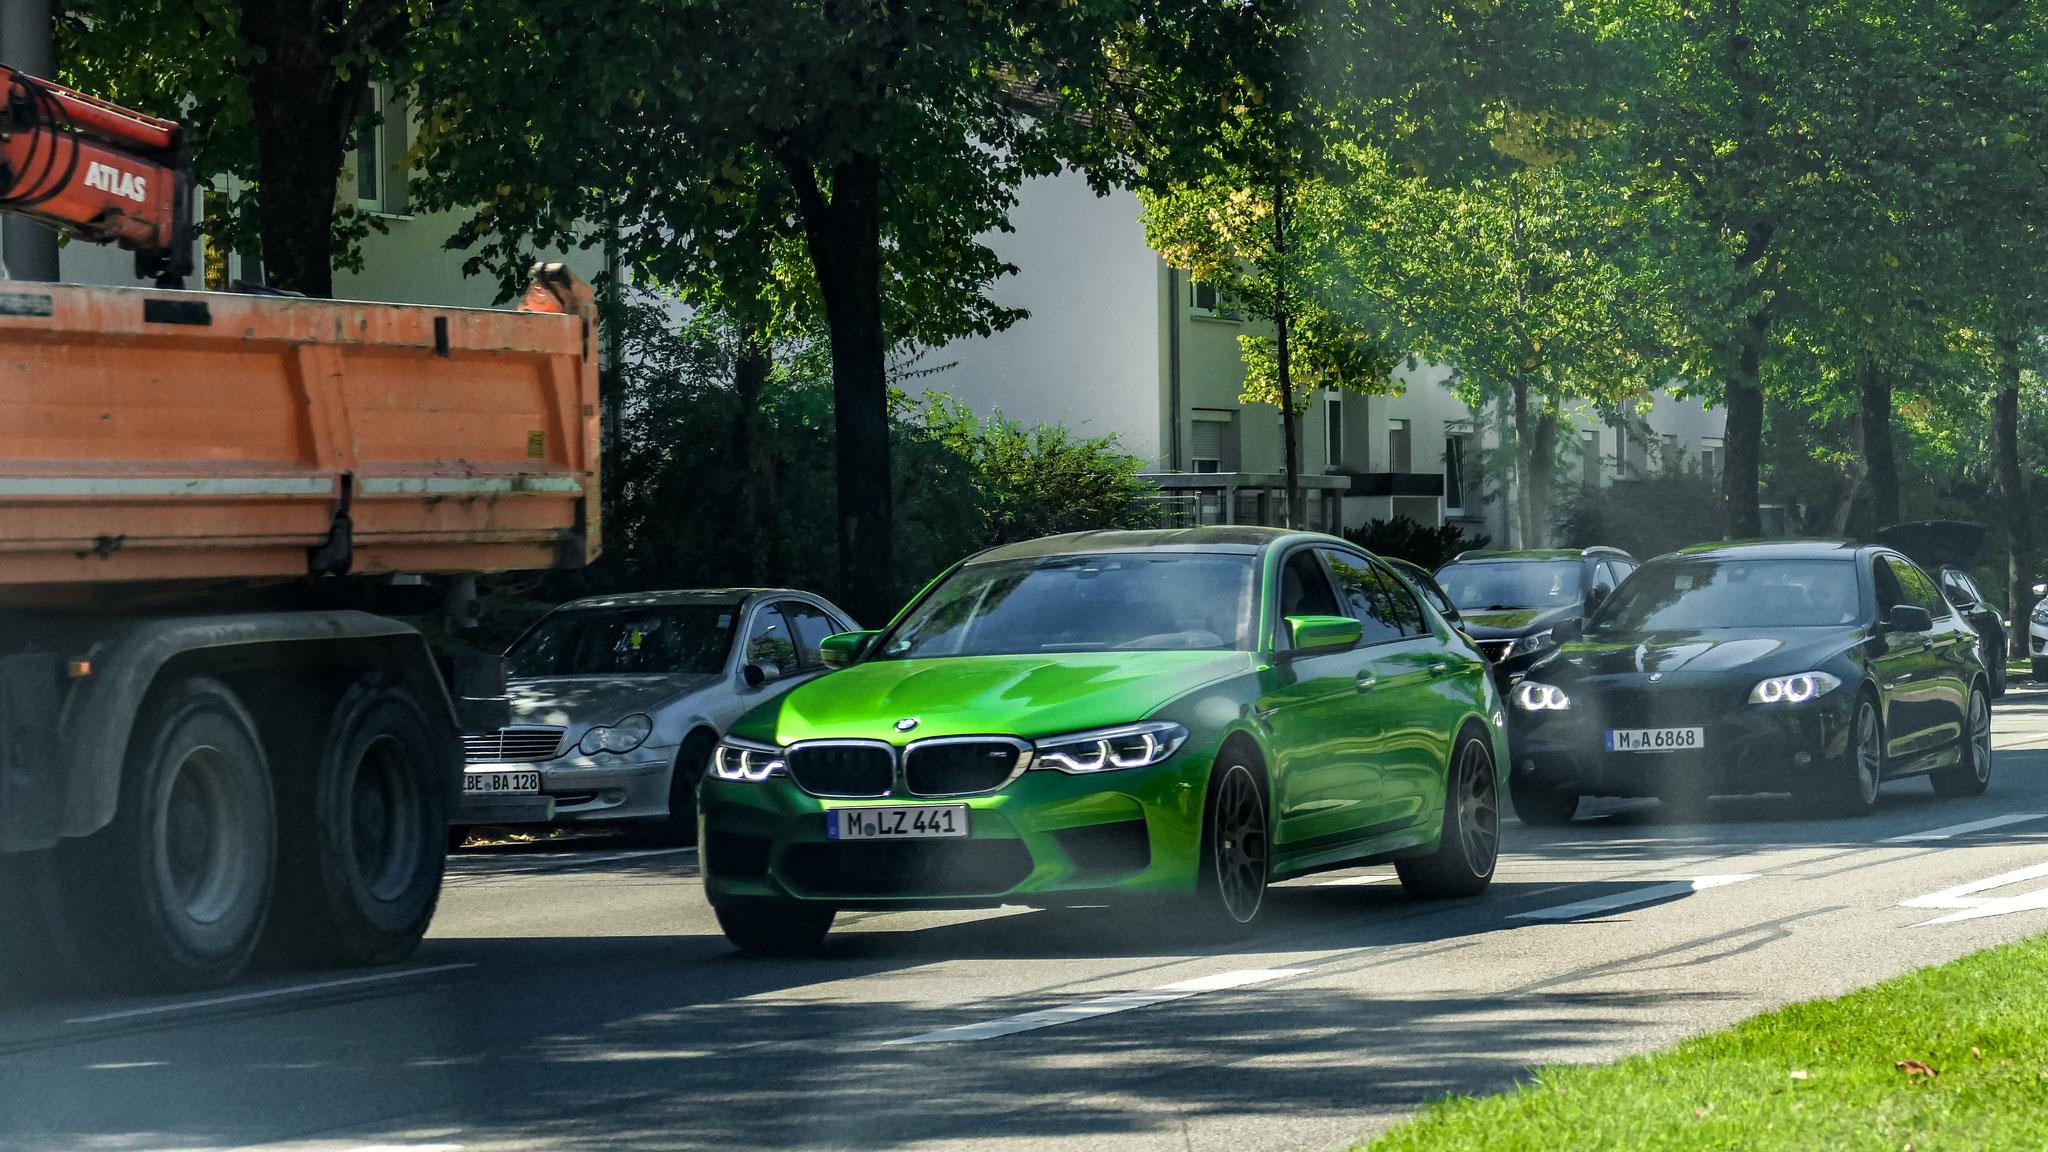 BMW M5 - M-LZ-441